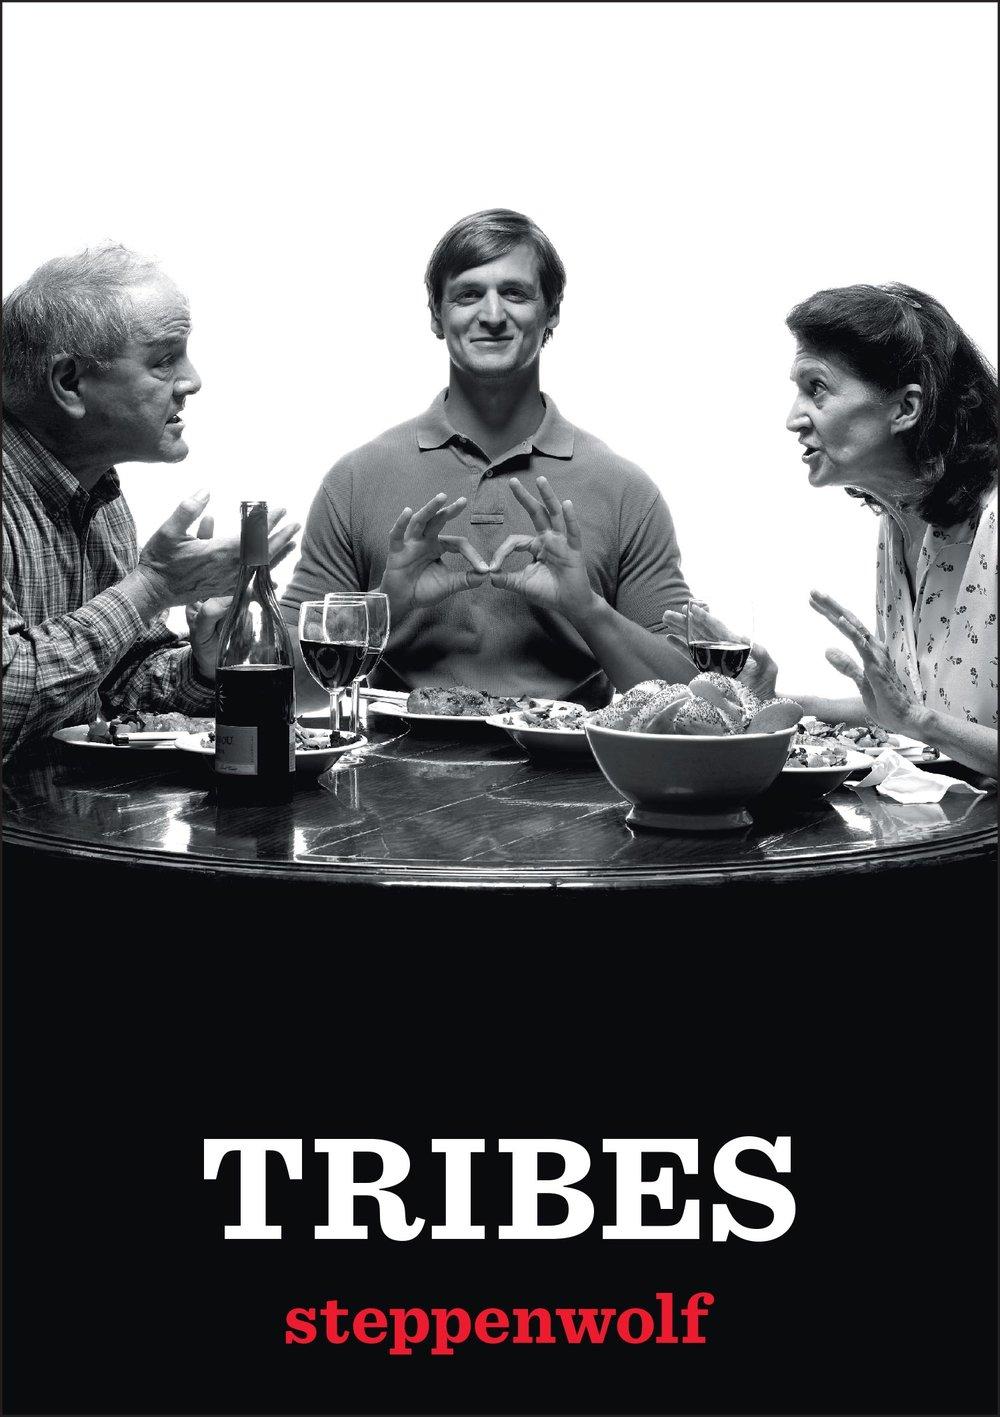 Tribes_Program_PRINT_cover.jpg